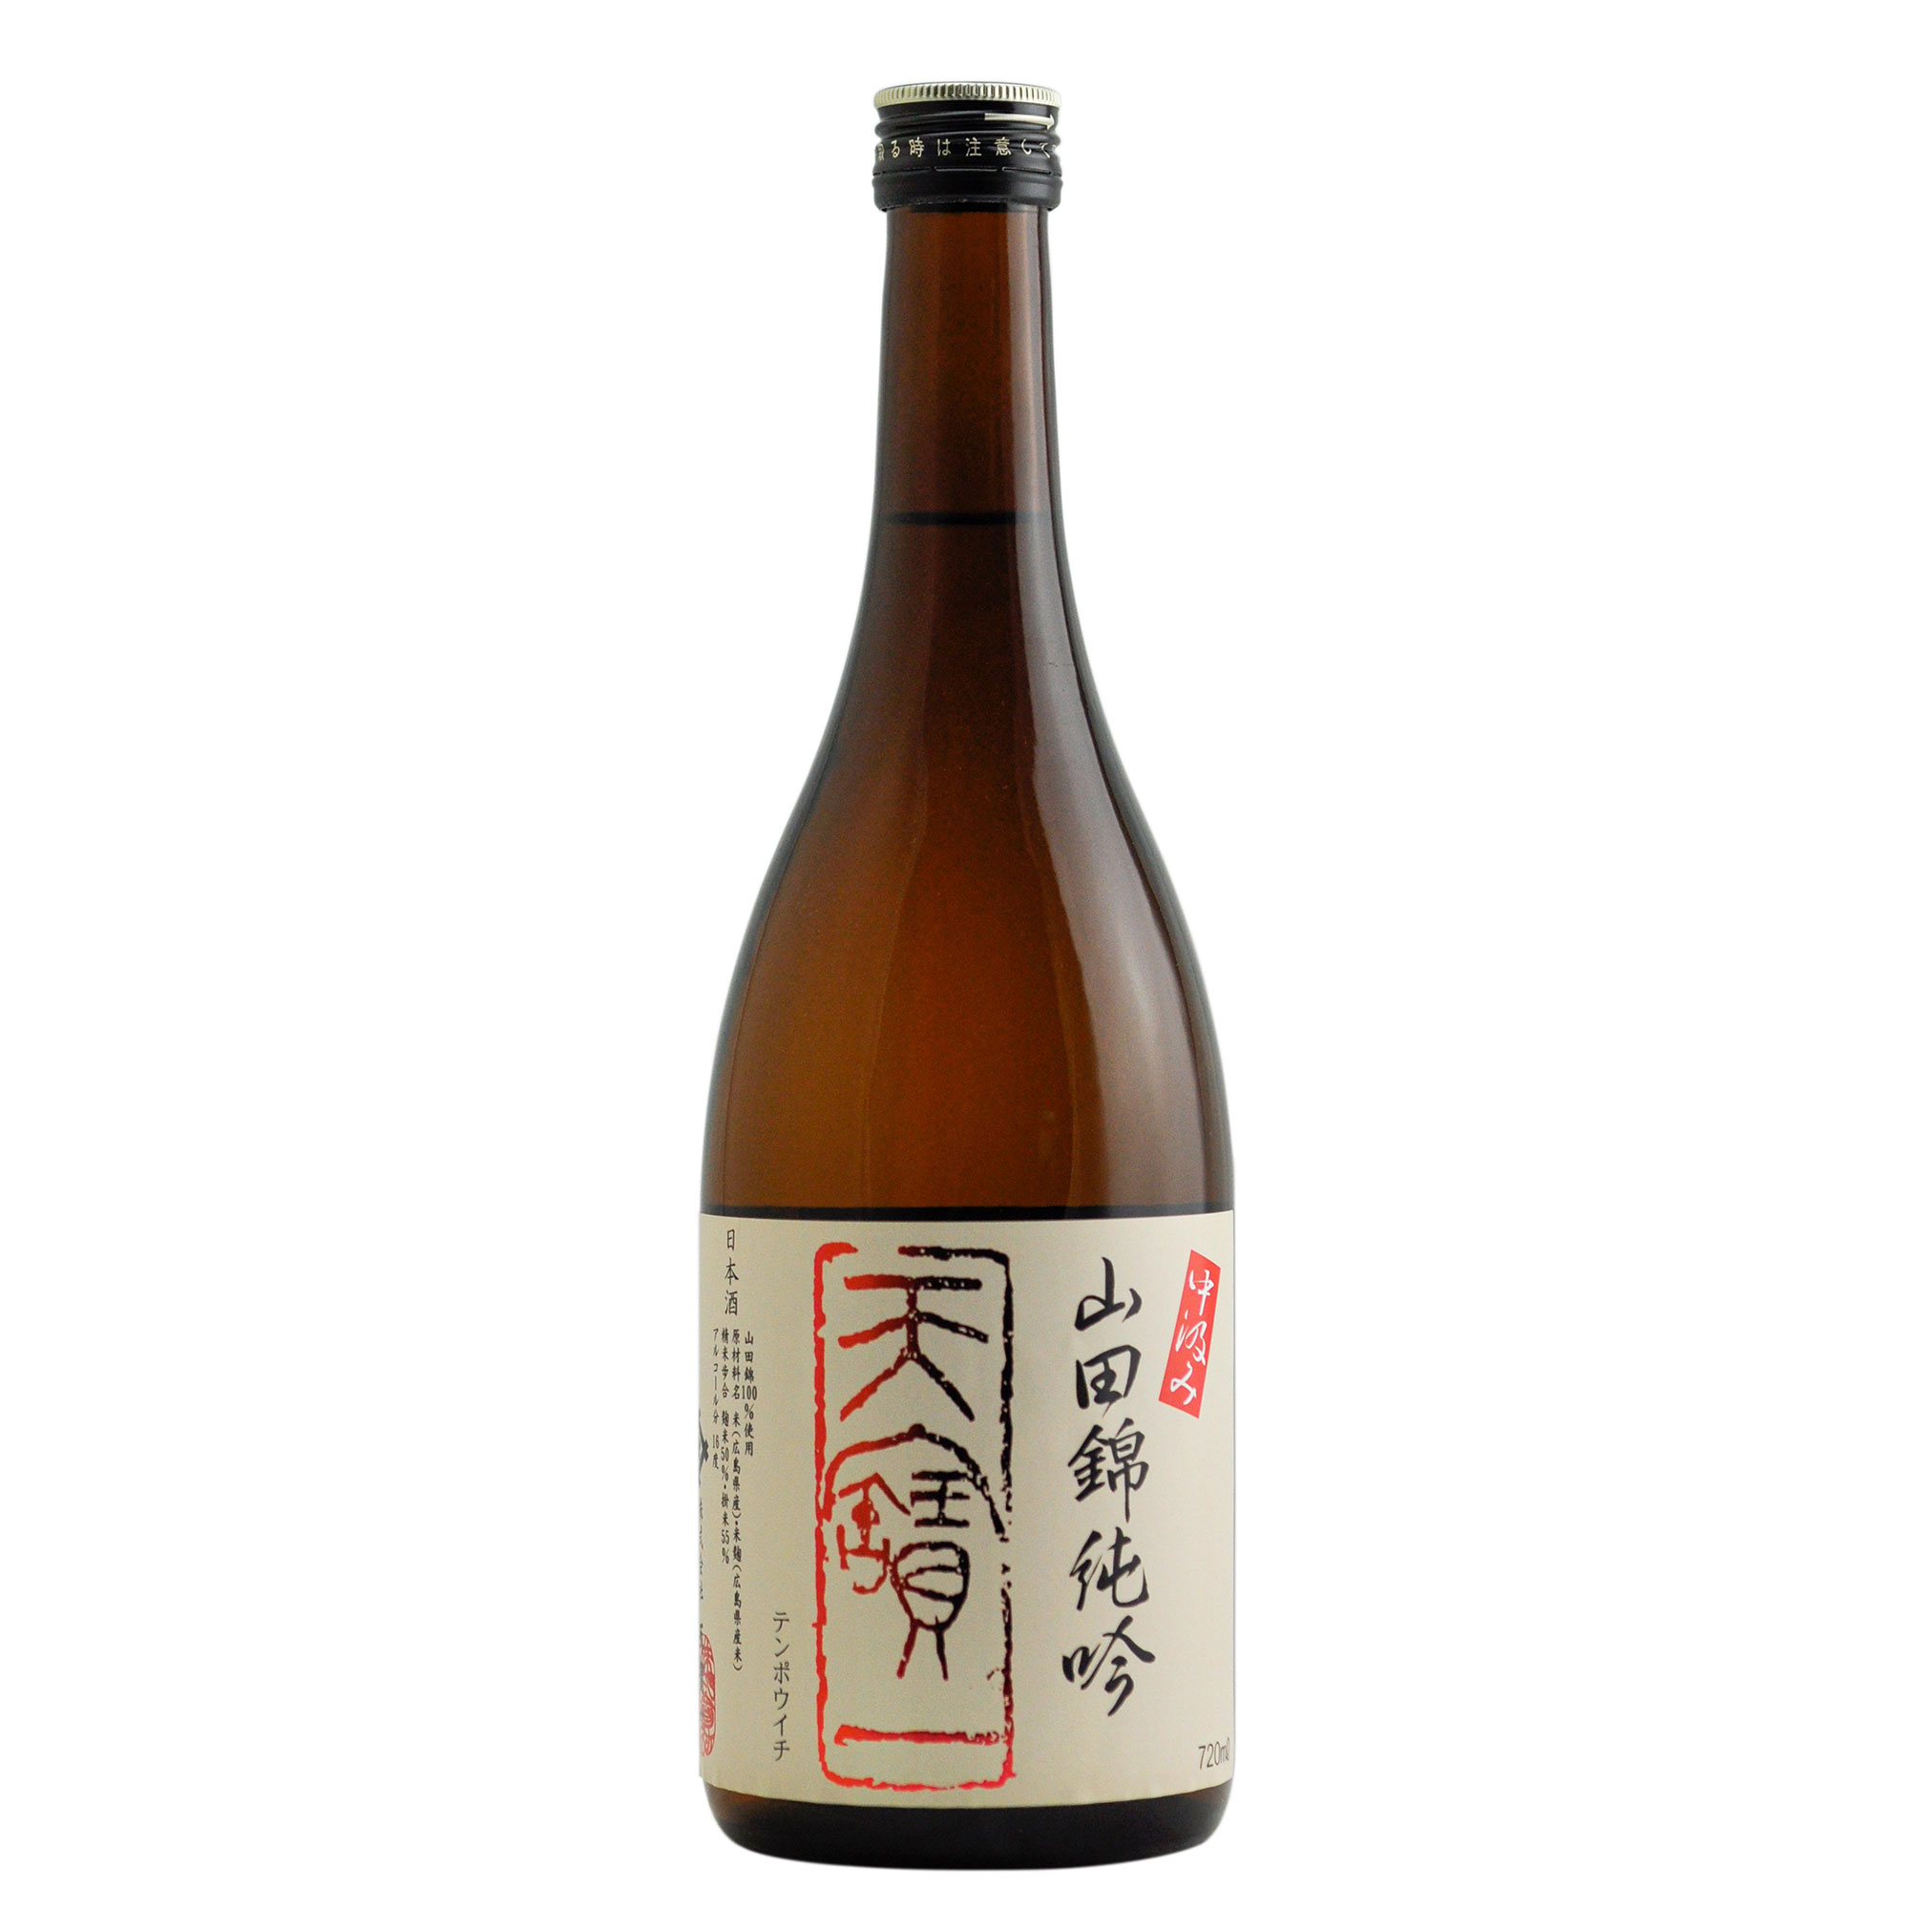 Tempoichi Junmai Ginjo Yamadanishiki Nakagumi 16% 720ml